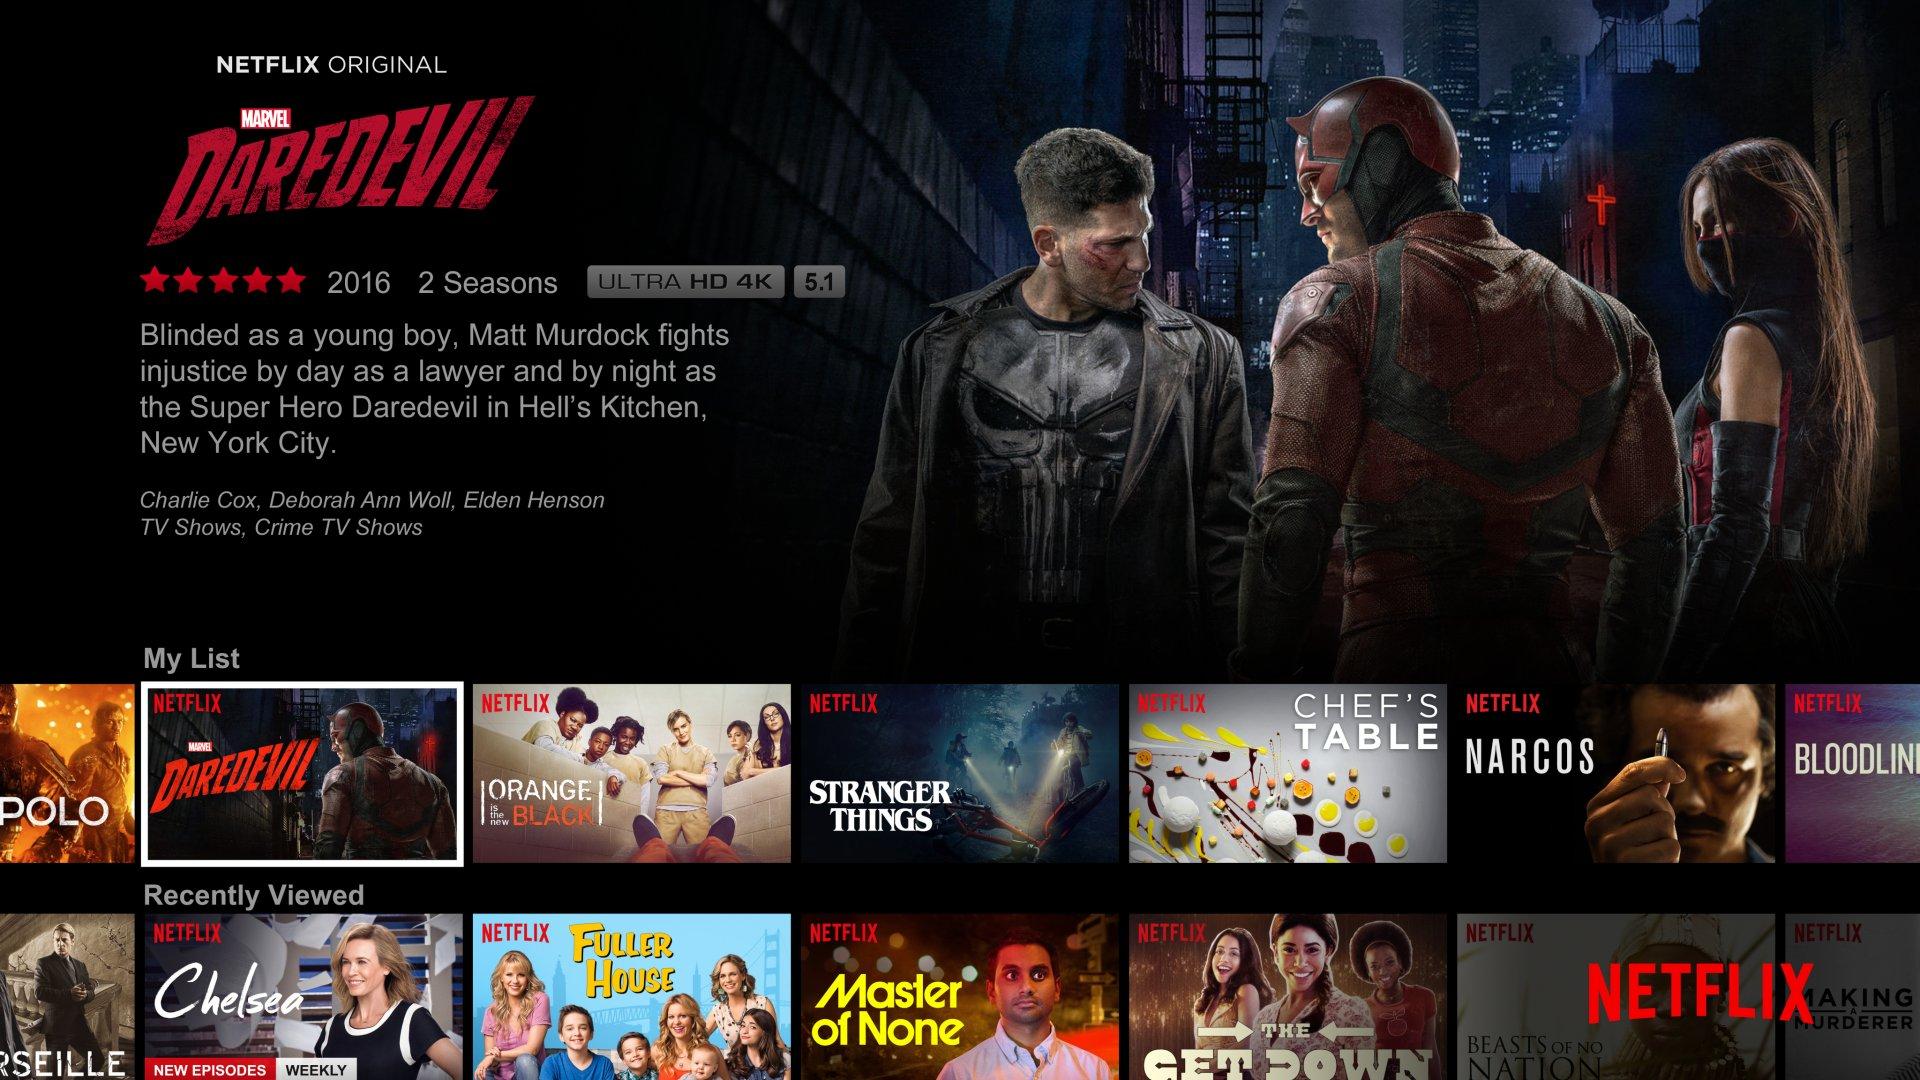 A Netflix menu screen featuring Marvel's Daredevil.